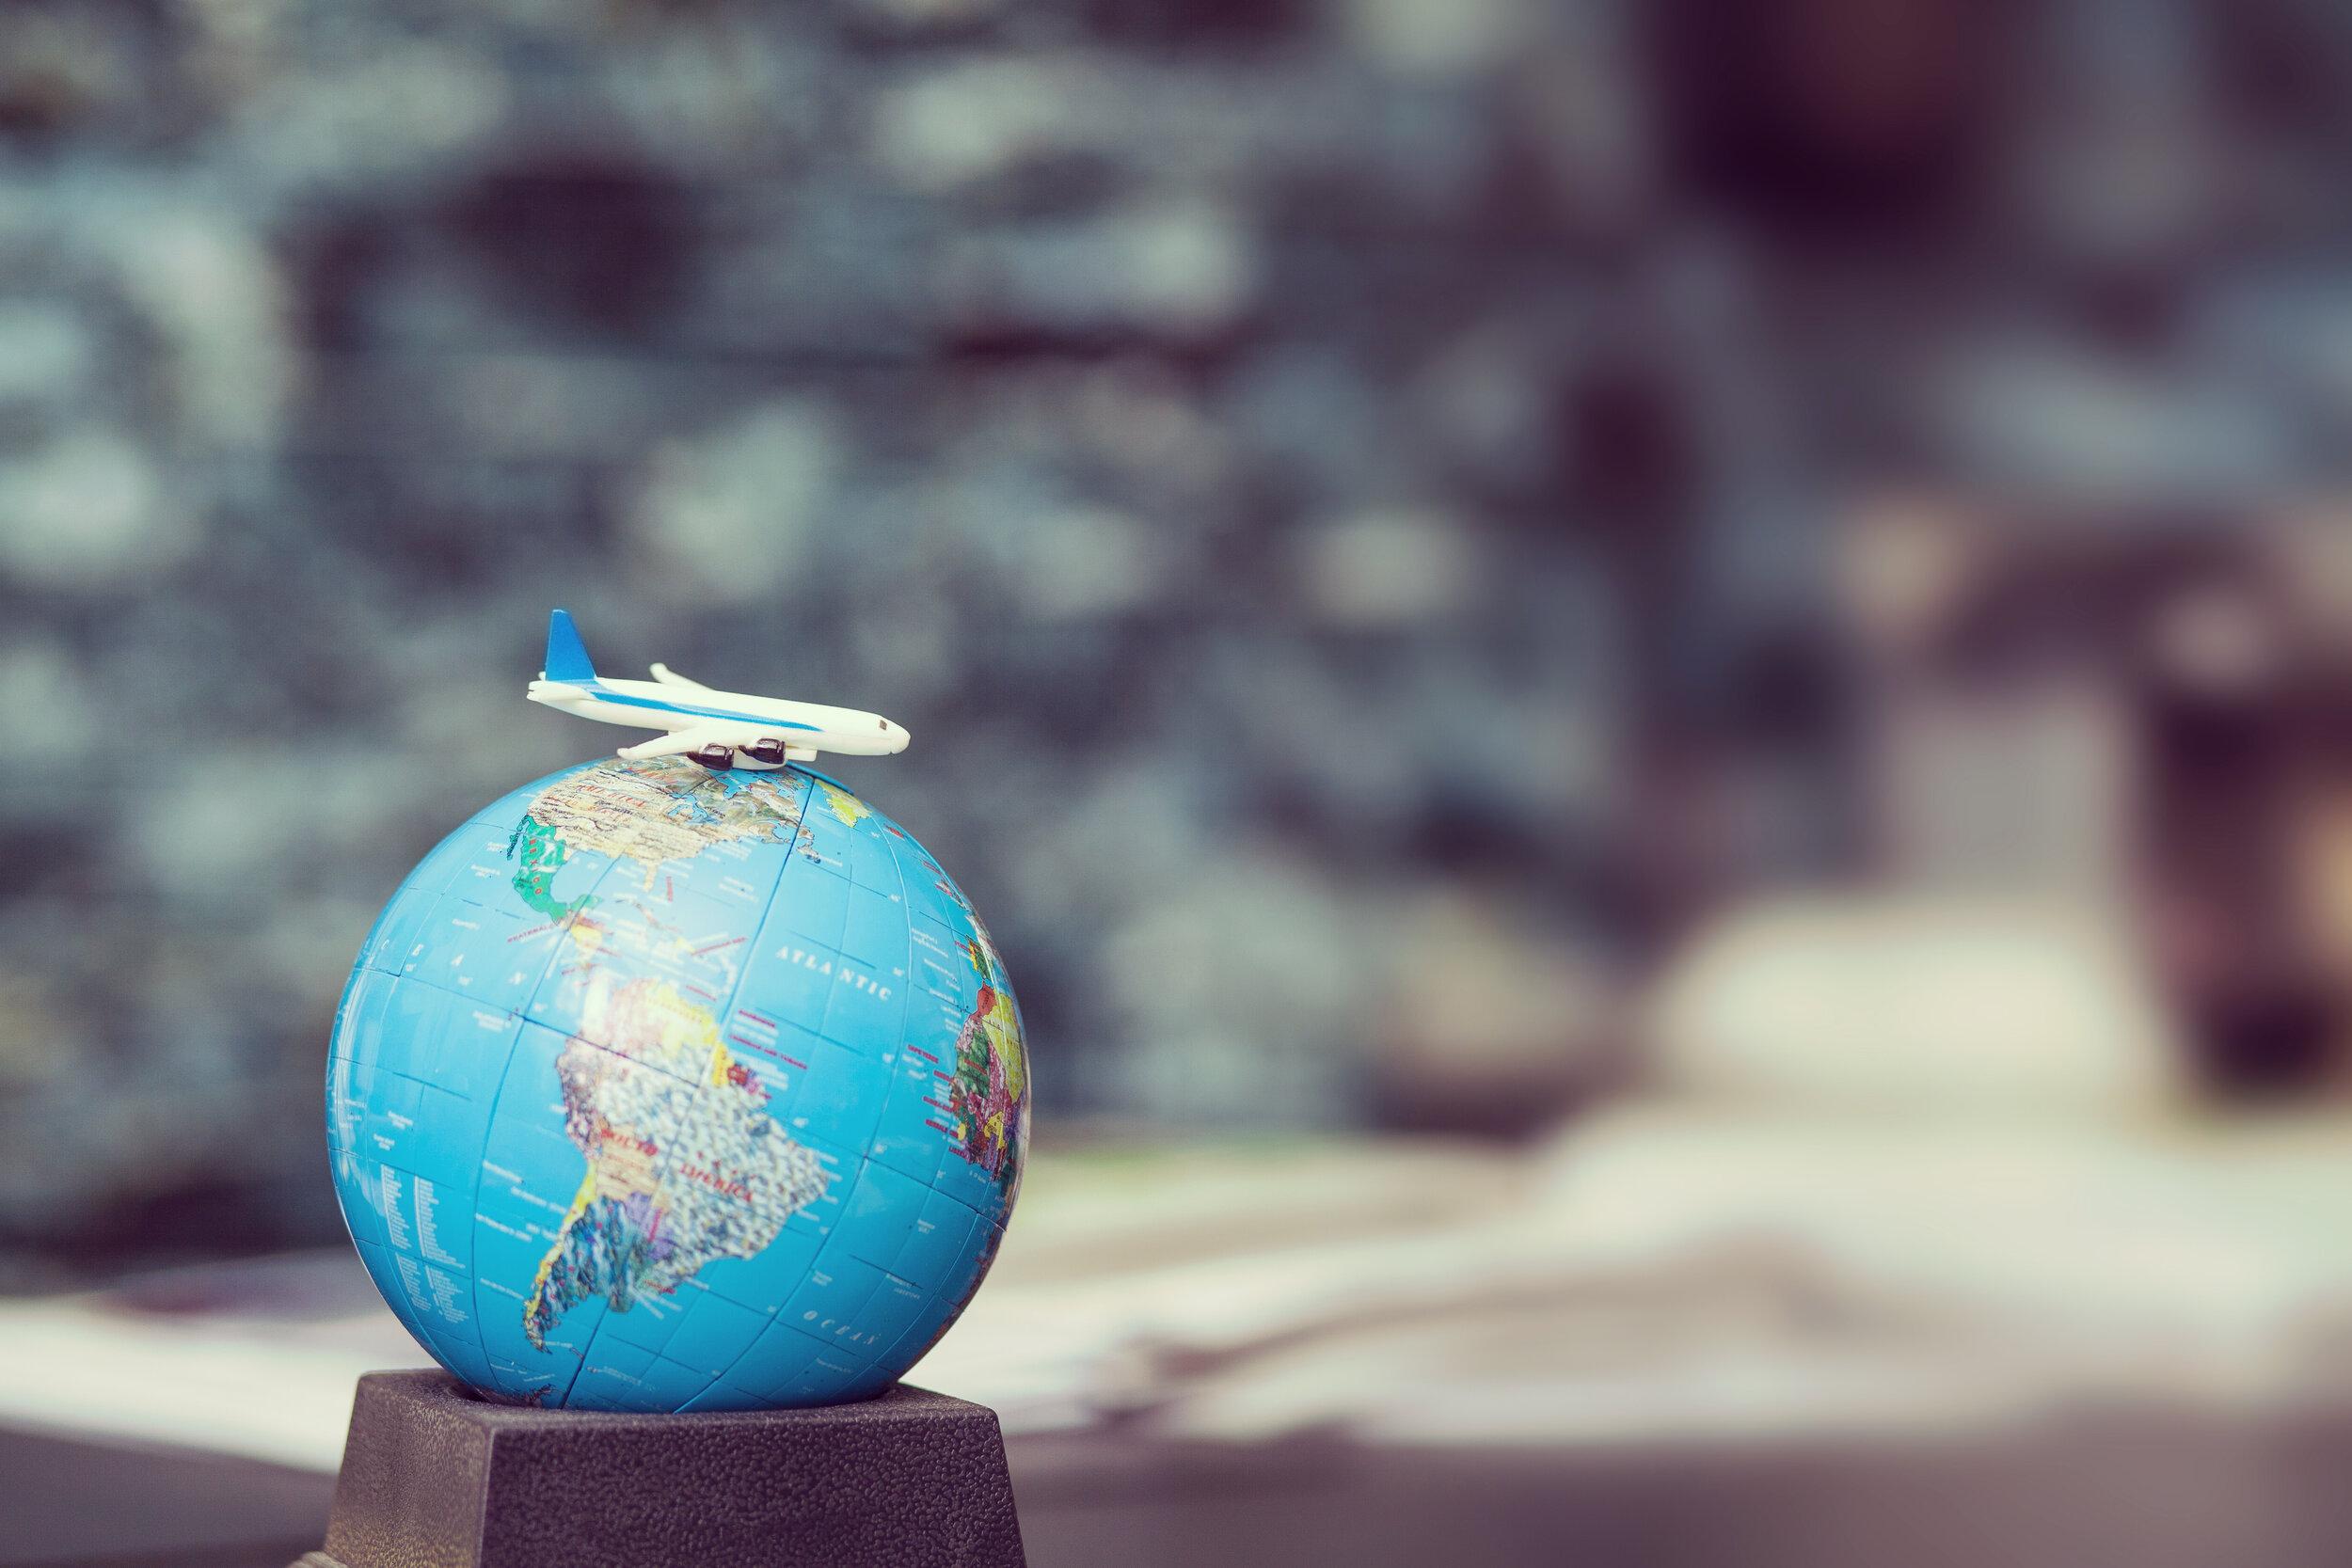 III. Personal Travels